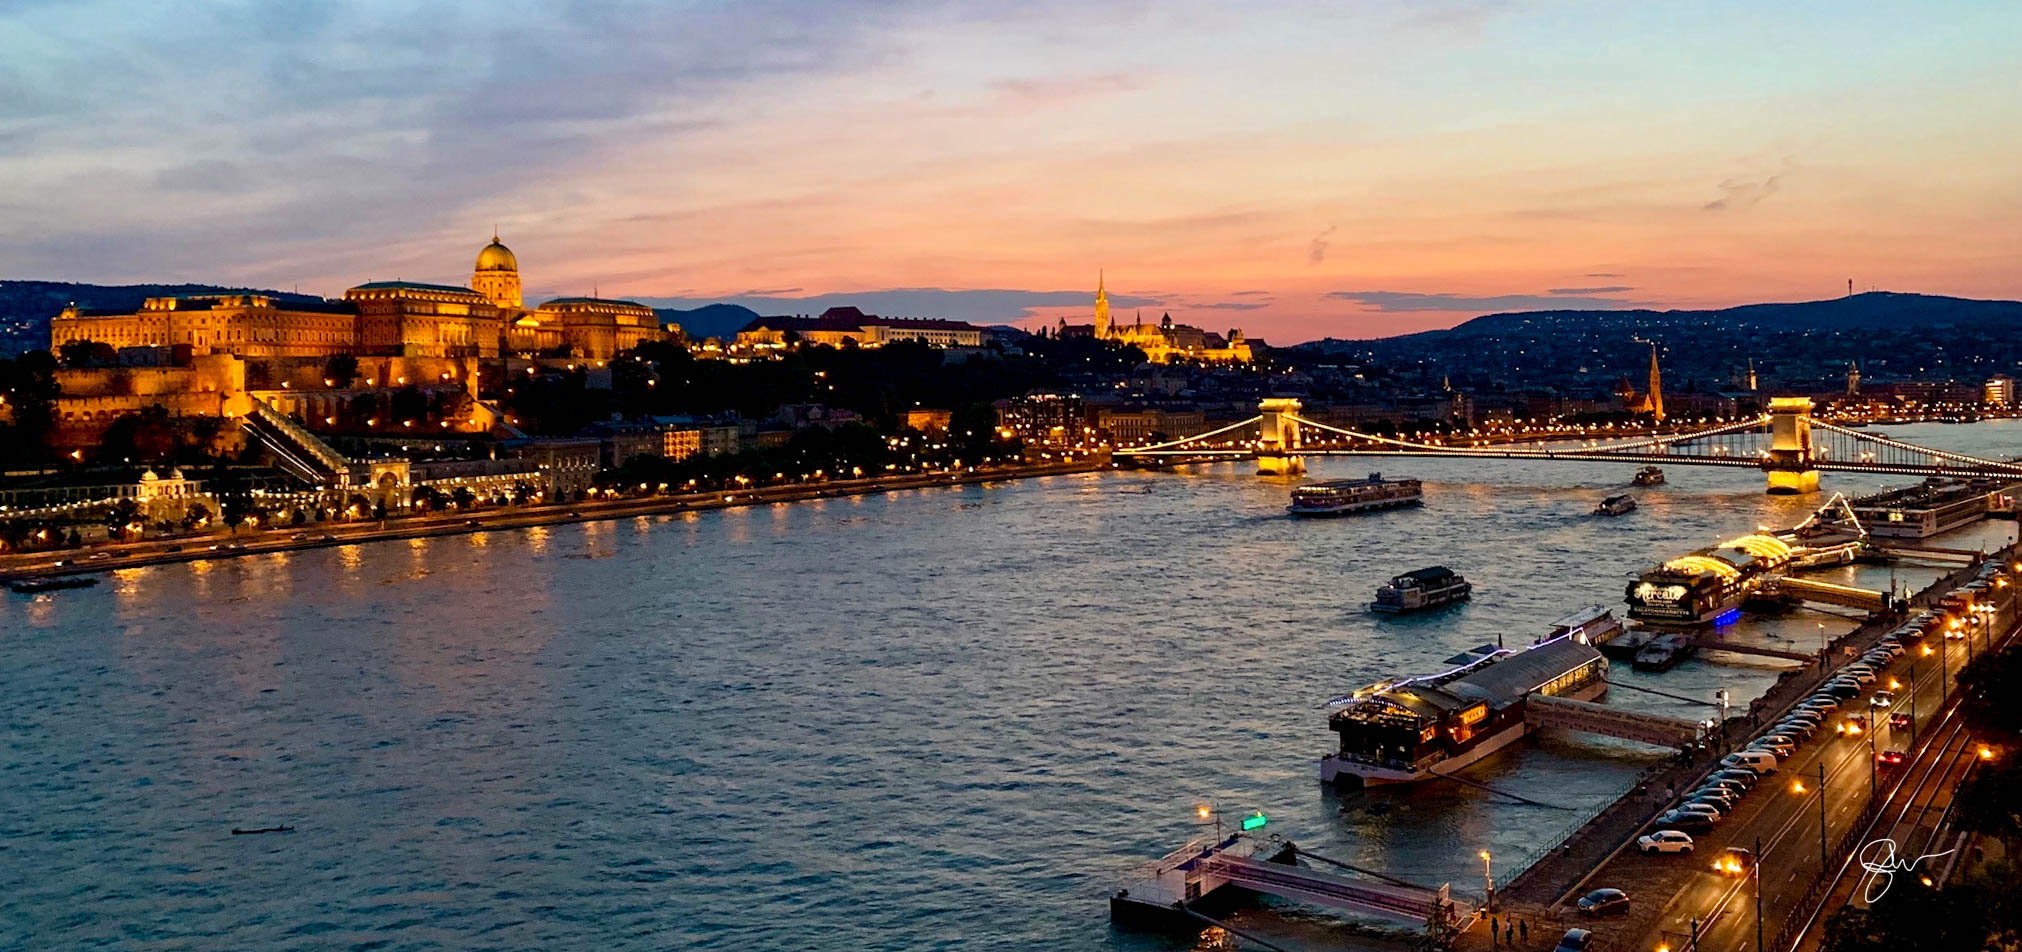 2019 Danube Cruise 5 Star-20.jpg